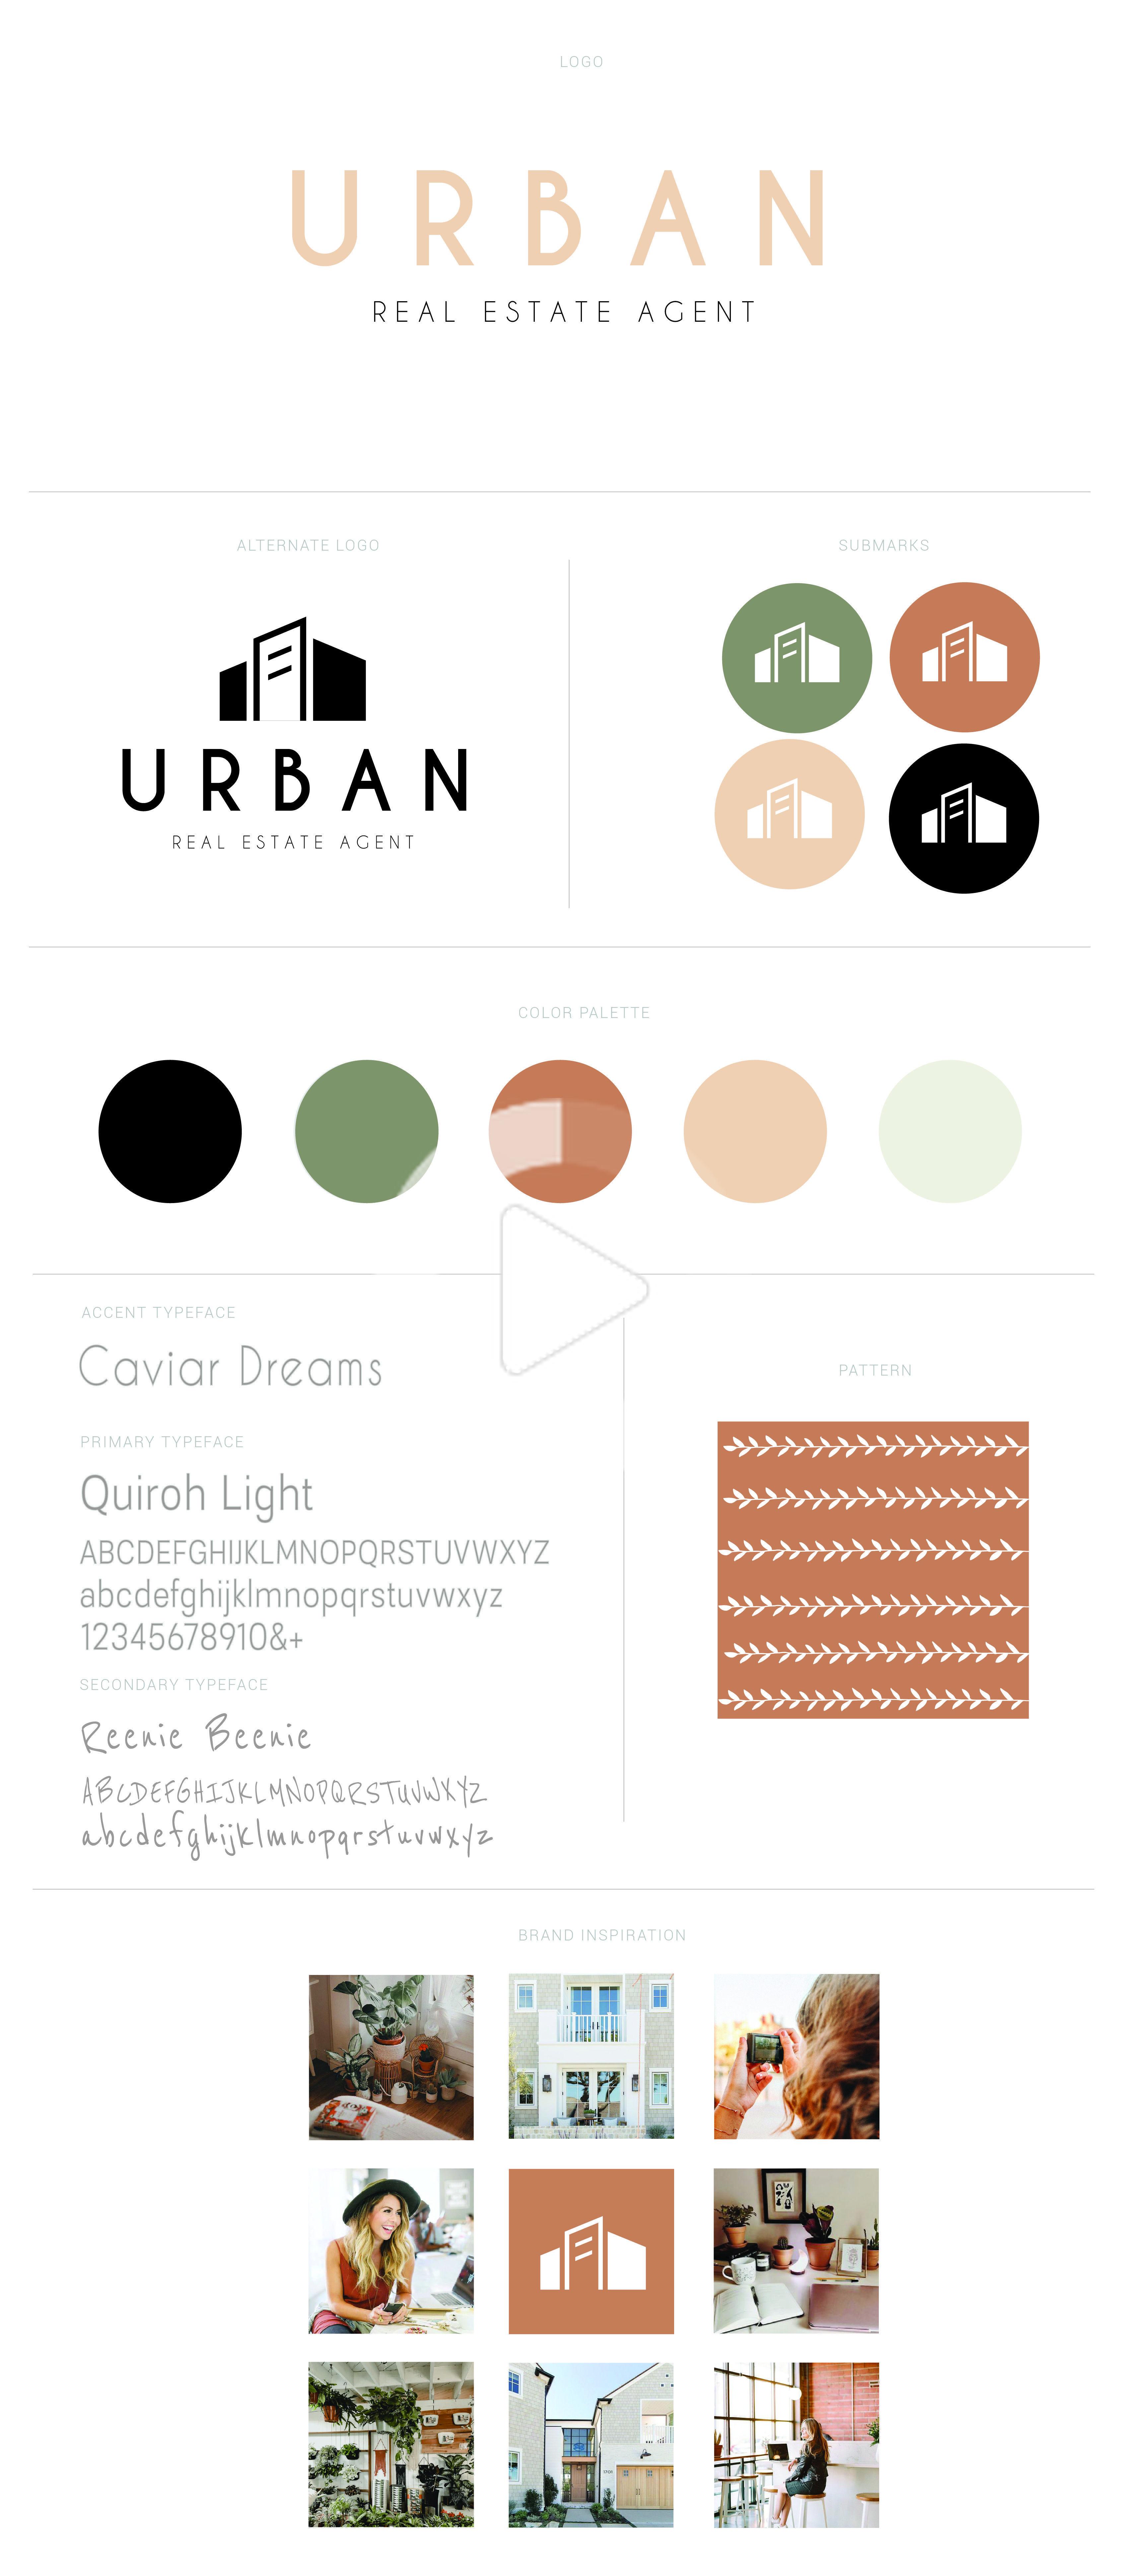 webdesign in 2020 Realtor branding, Real estate logo